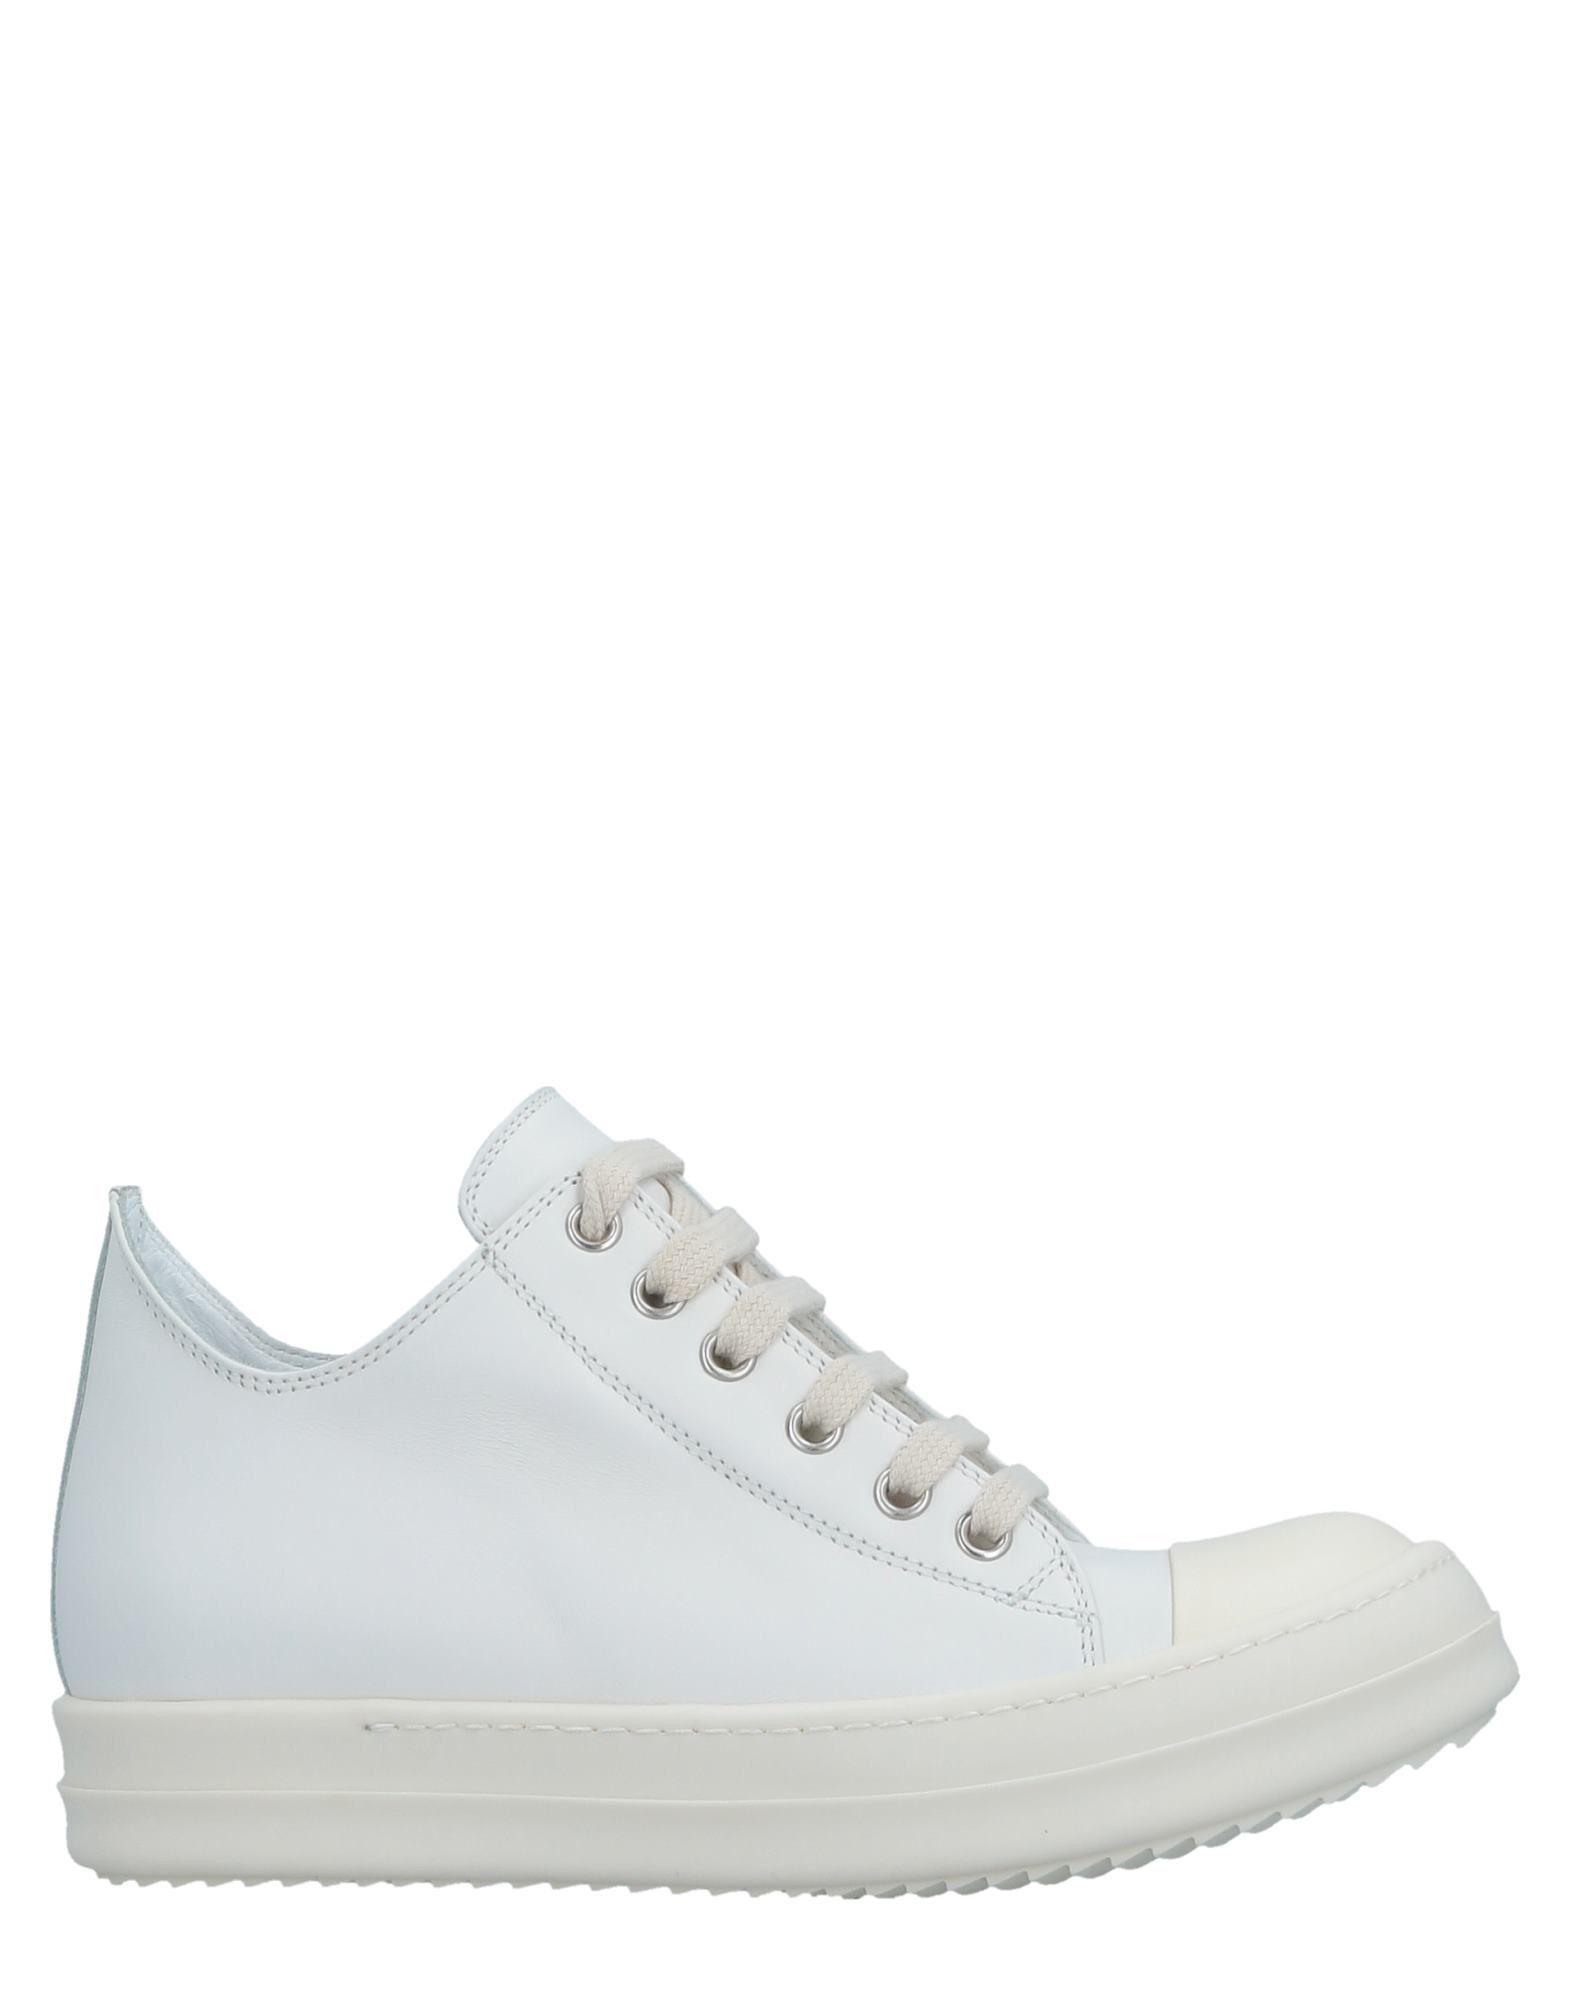 Rick Rick Rick Owens Sneakers Damen  11518544QF Beliebte Schuhe 93d7c8